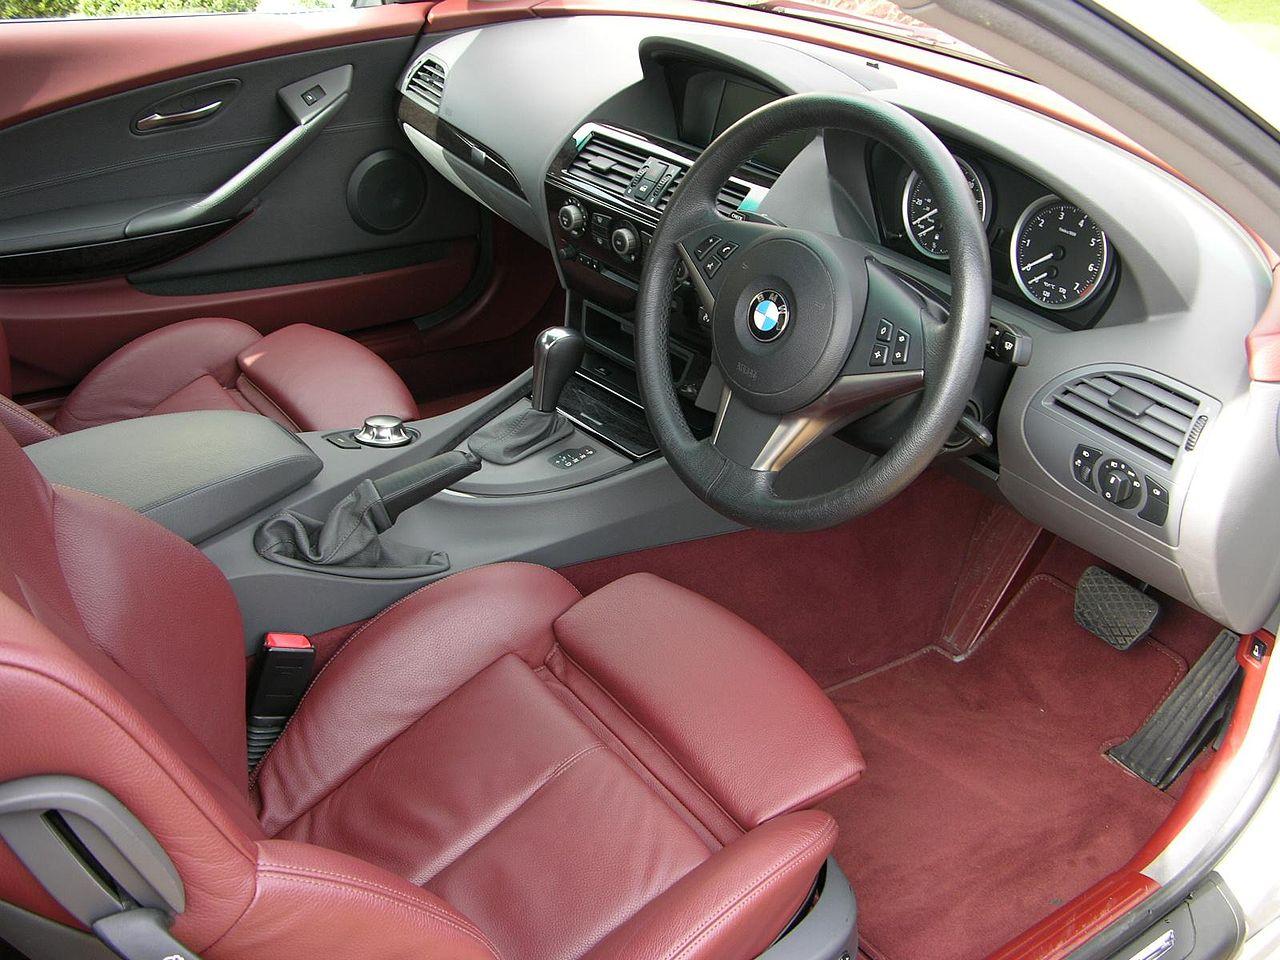 BMW 2004 bmw 645ci : File:2004 BMW 645Ci Sport - Flickr - The Car Spy (22).jpg ...